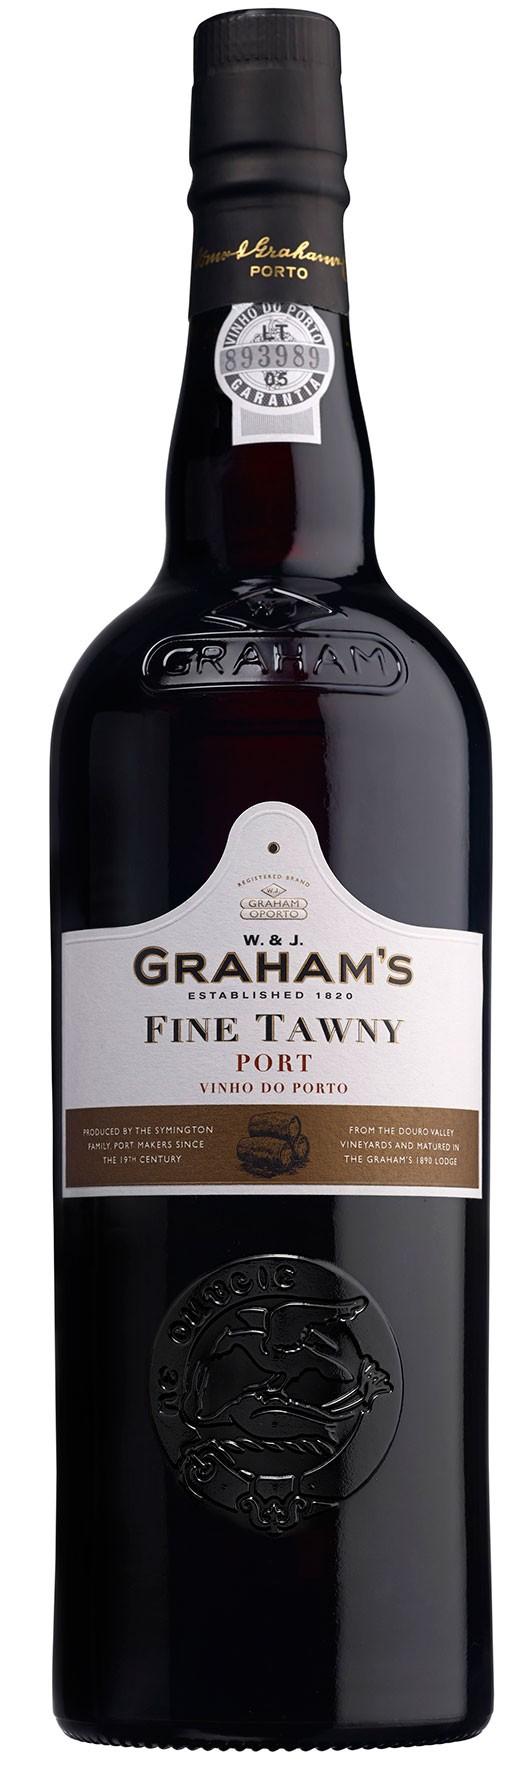 FLES GRAHAM'S PORT FINE TAWNY 0.75 LTR-3226